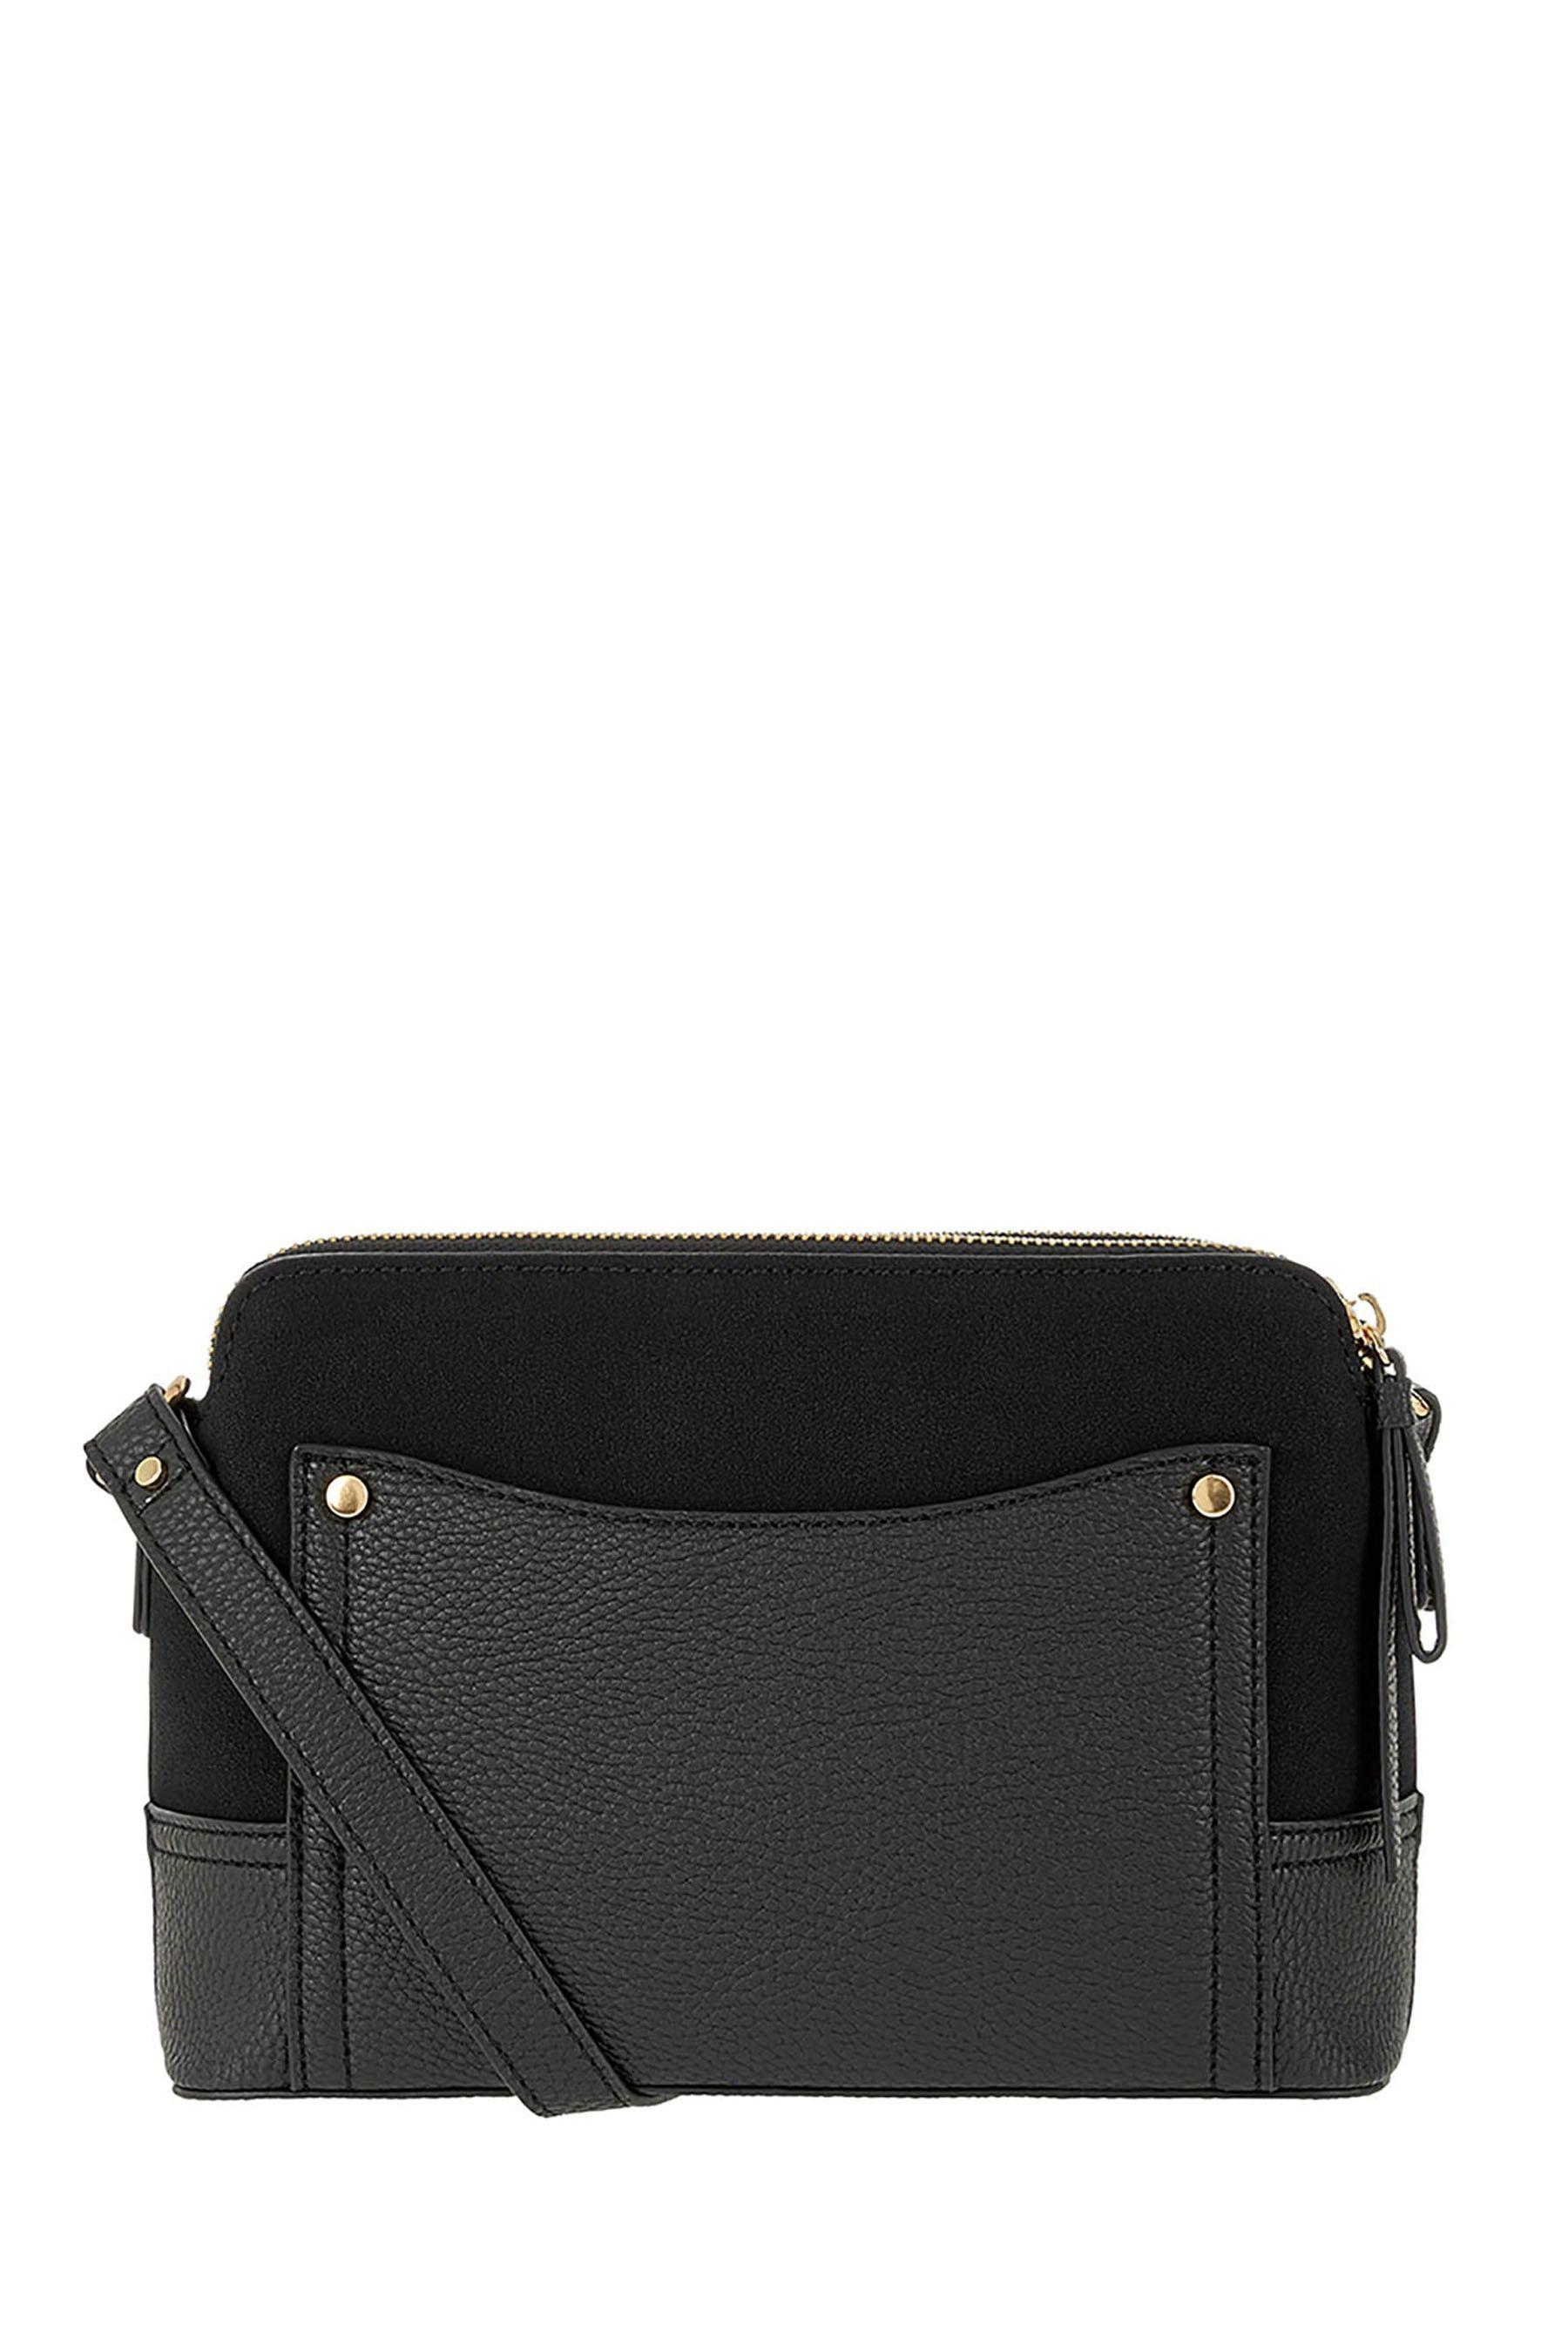 Accessorize Black Cross Body Bag